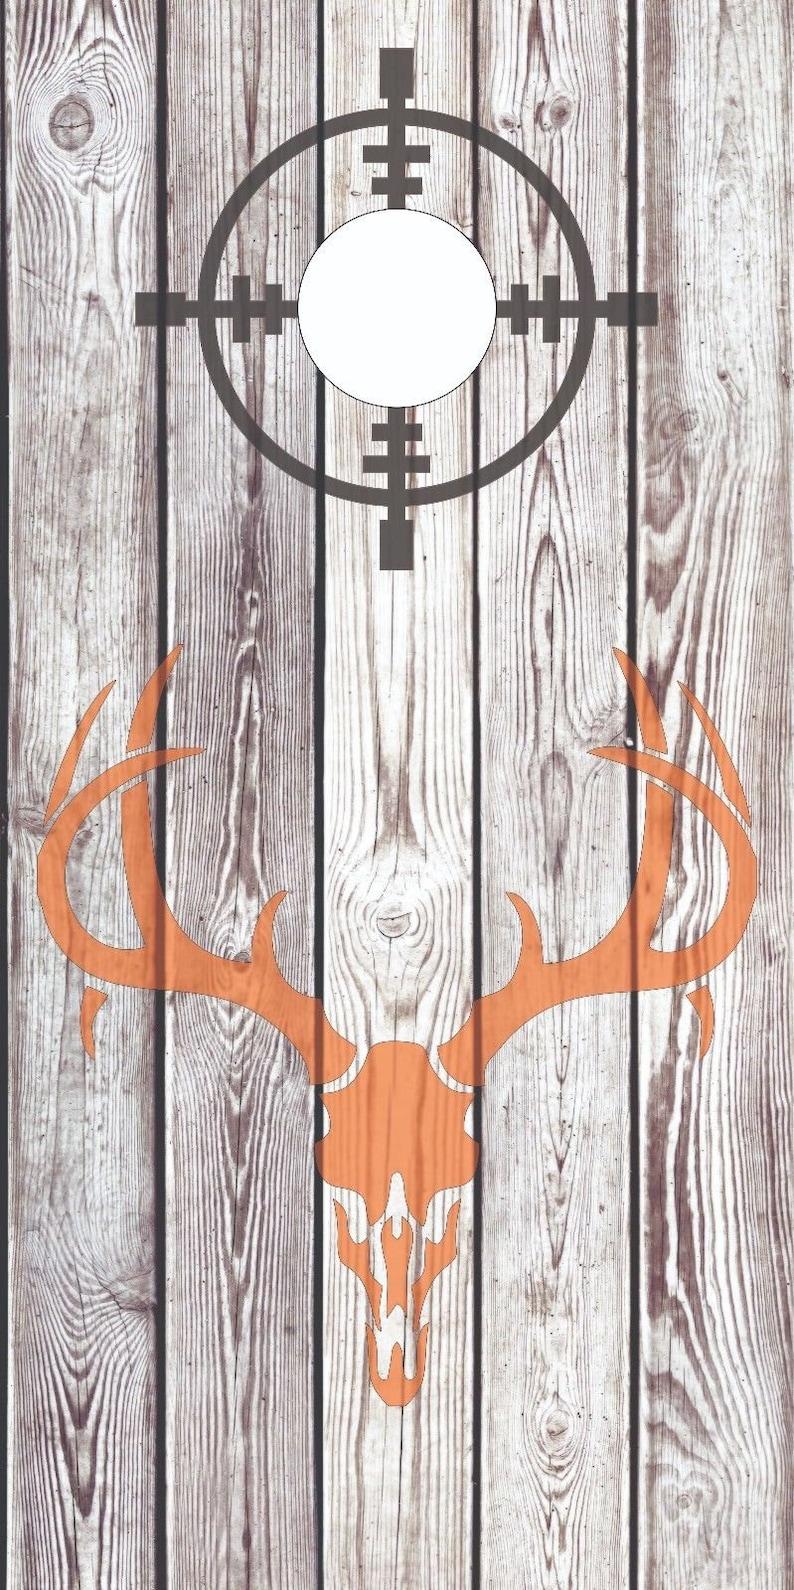 Deer Skull Hunting wood Cornhole Board Skin Wrap Decal SET w FREE Lamination